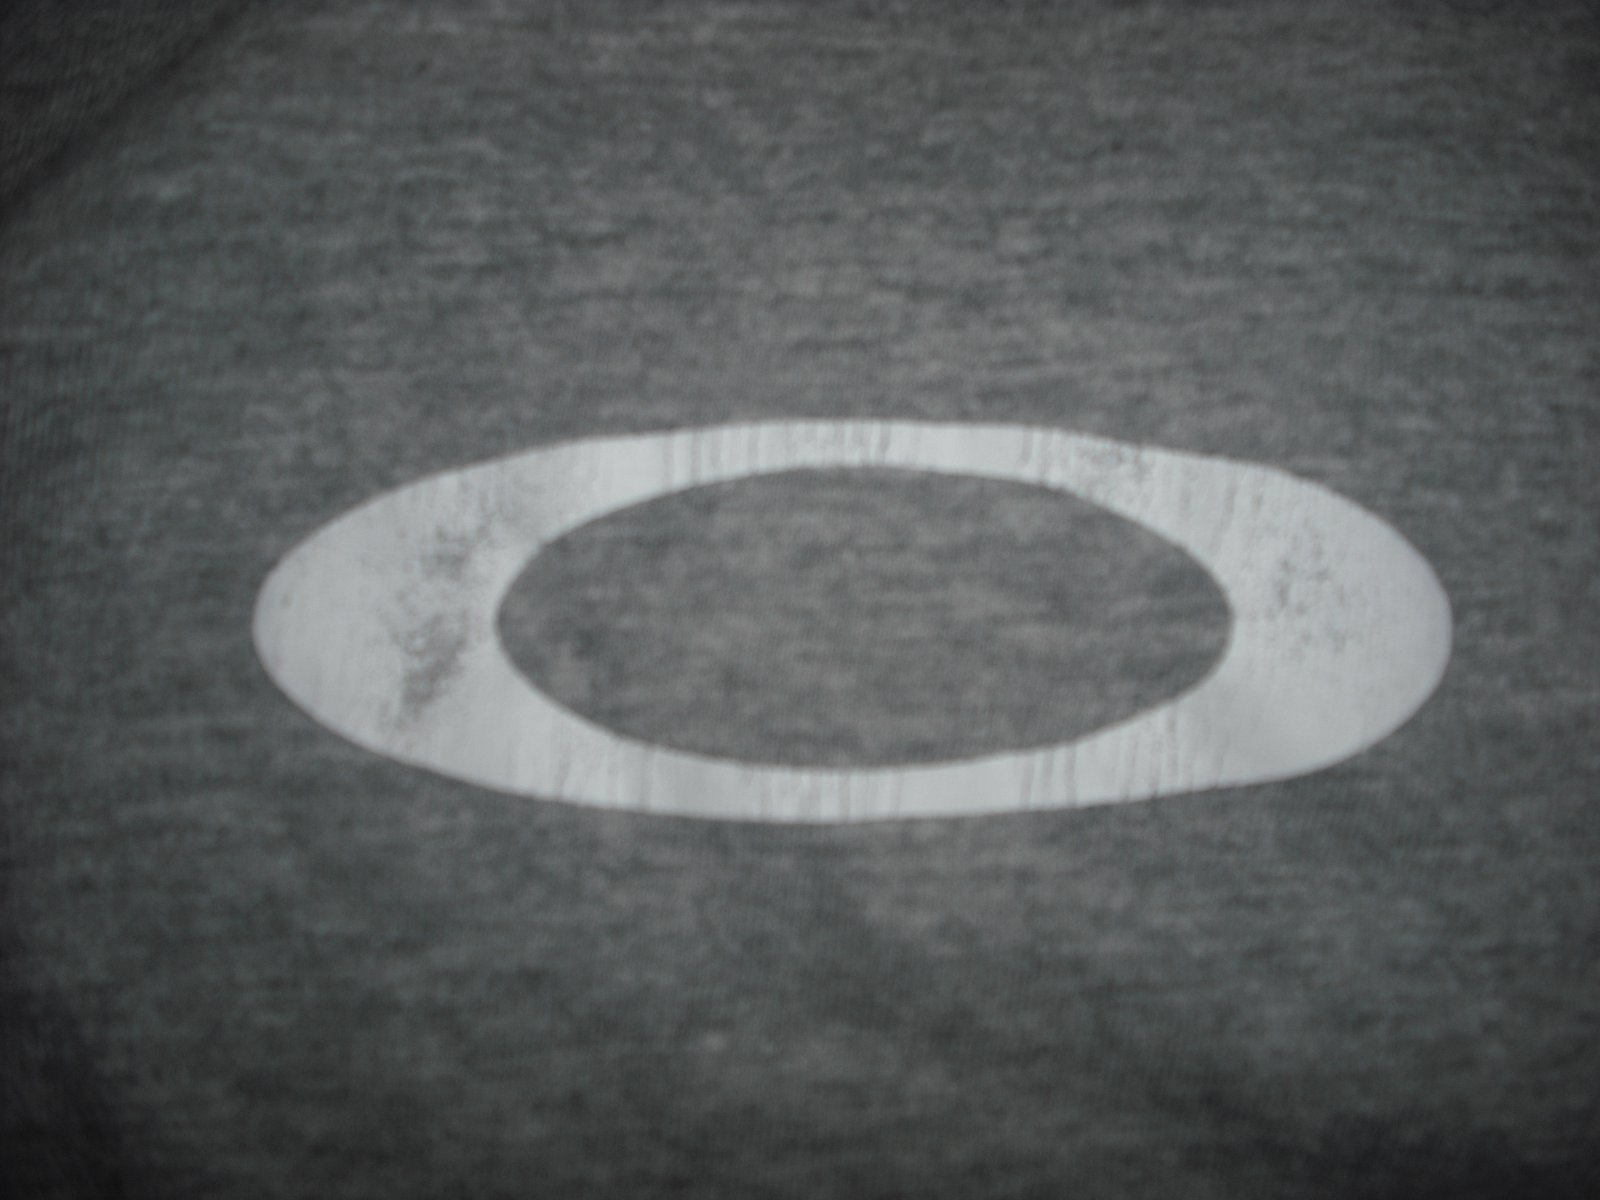 Cracking on the oakley logo